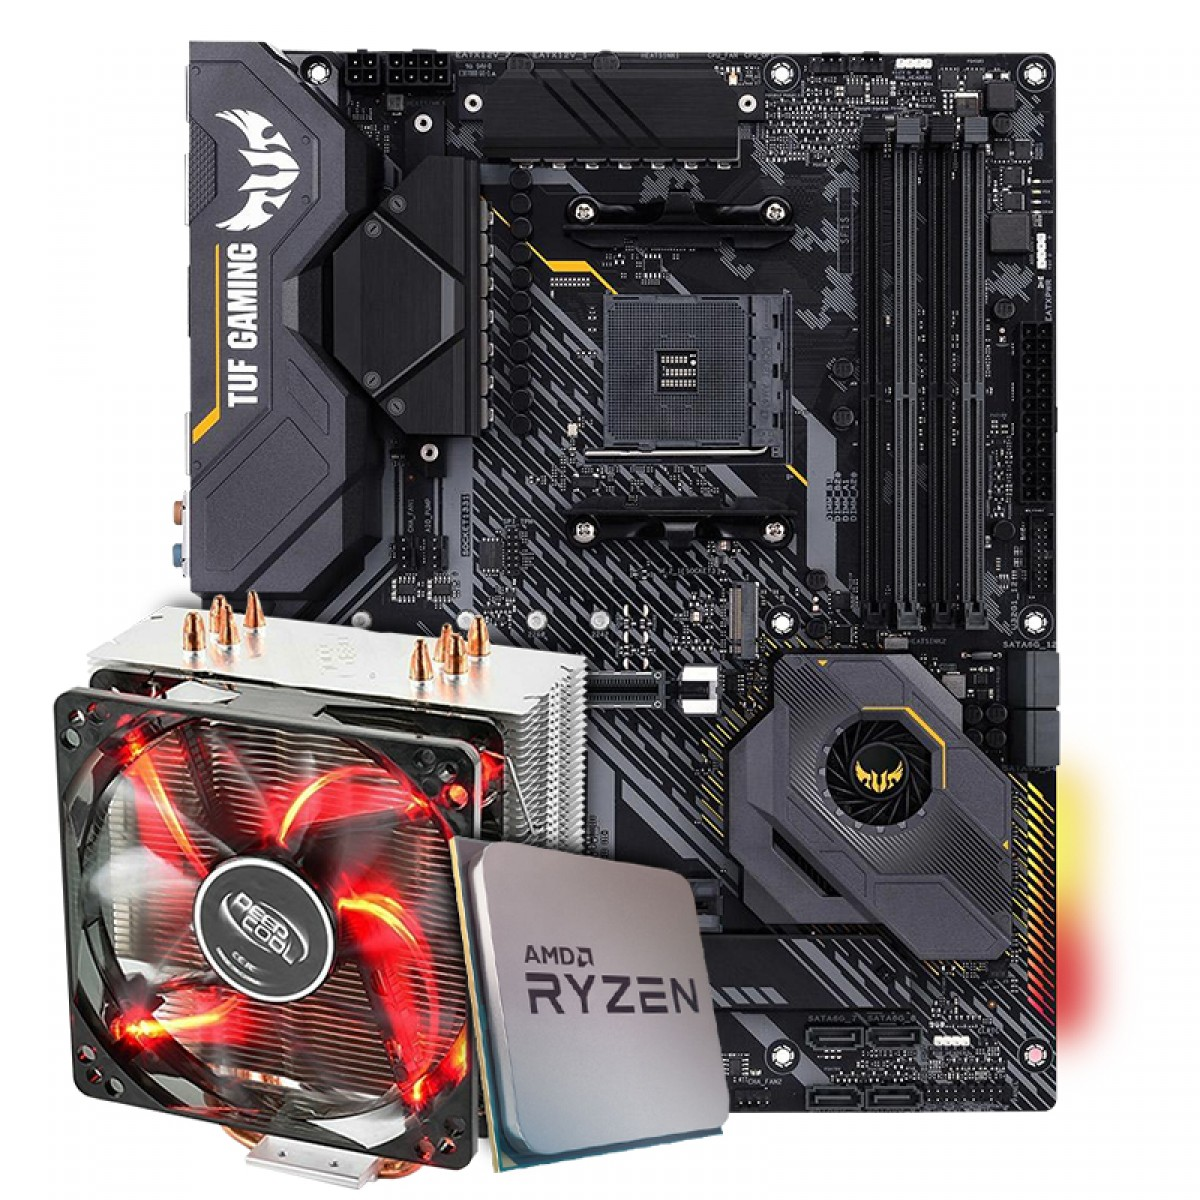 Kit Upgrade Placa Mãe Asus TUF Gaming X570-Plus AMD AM4 + Kit Processador AMD Ryzen 9 3900x 3.8ghz + Cooler Deepcool Gammaxx 400 de 120mm